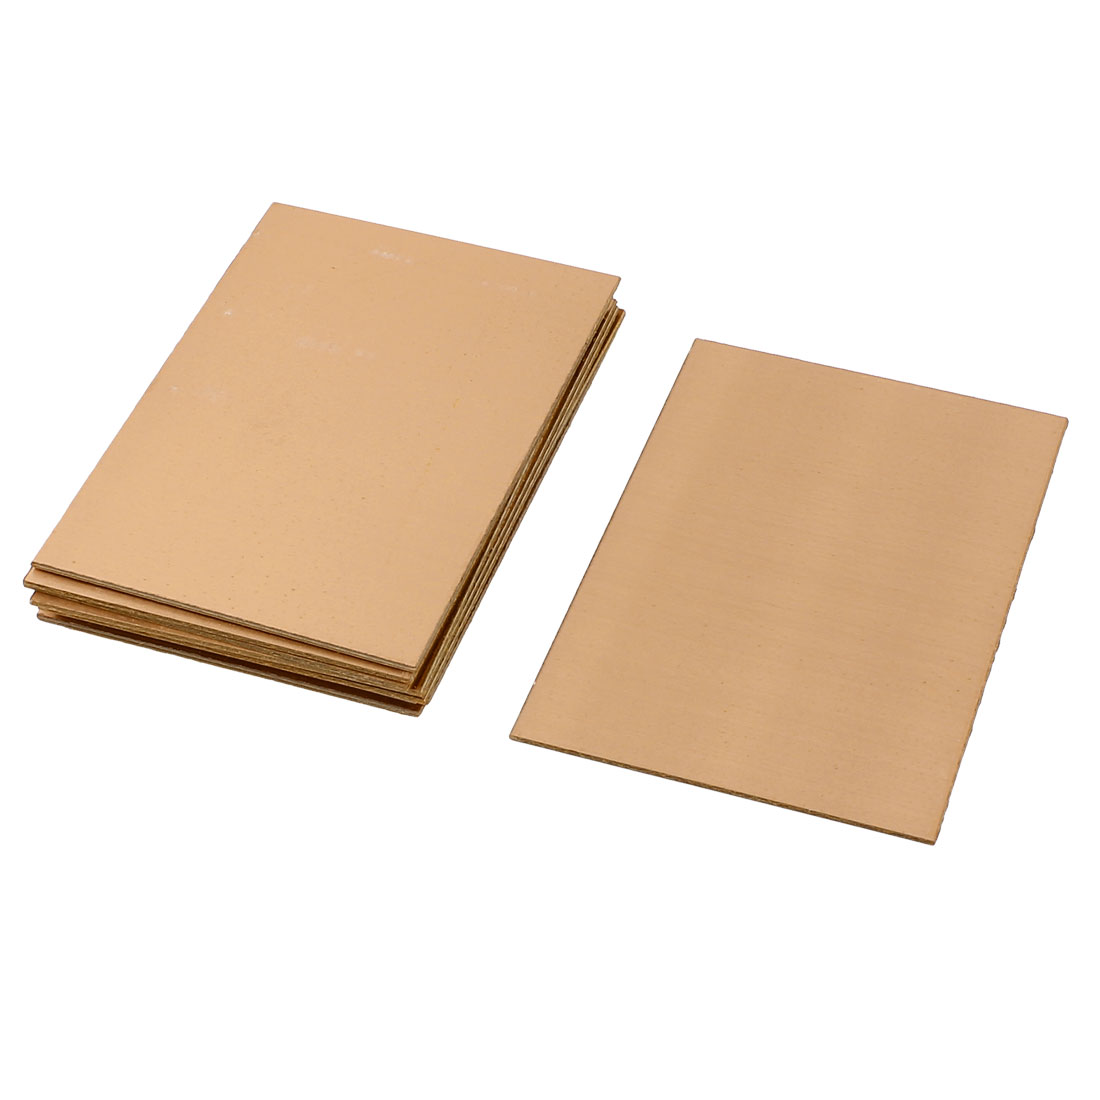 10Pcs 70 x 100 x 1.5mm FR-4 Single Side Copper Clad PCB Laminate Board